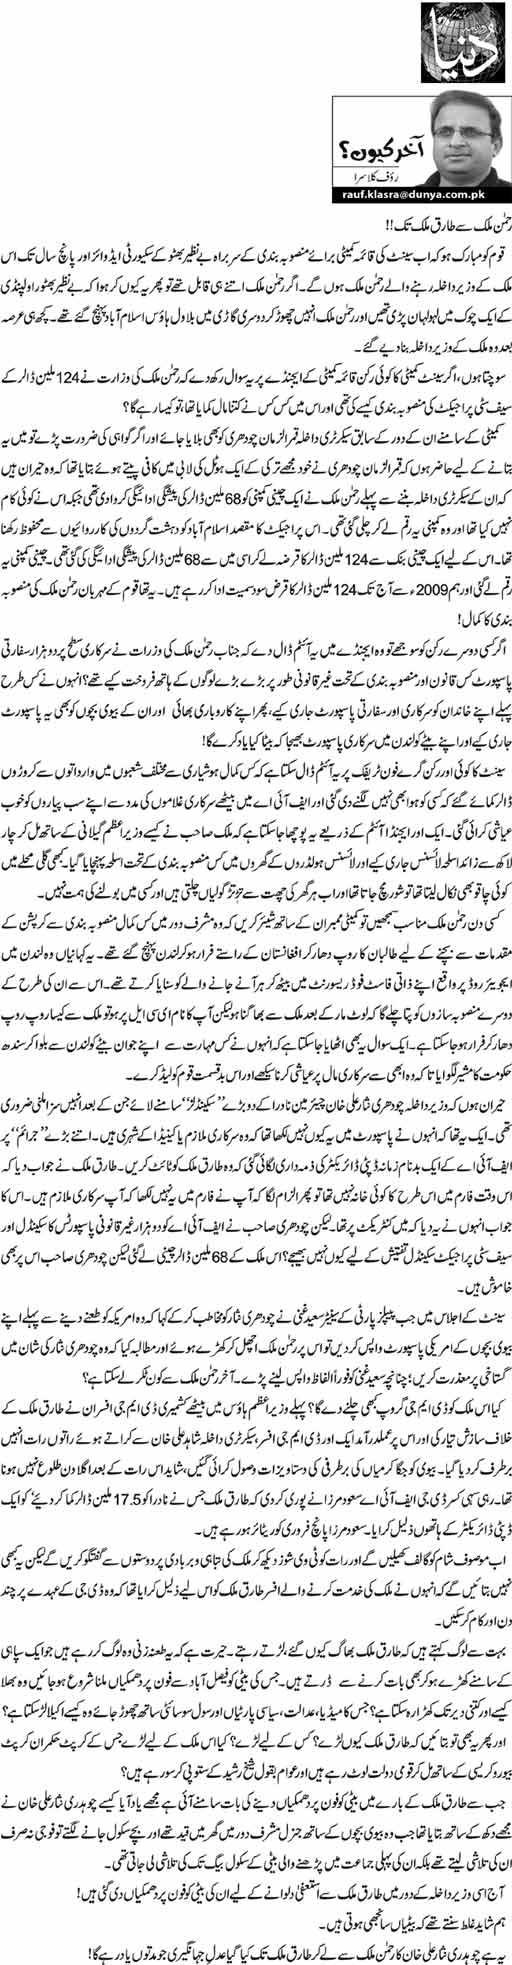 Rehman Malik Se Tariq Malik Tak ! - Rauf Klasra